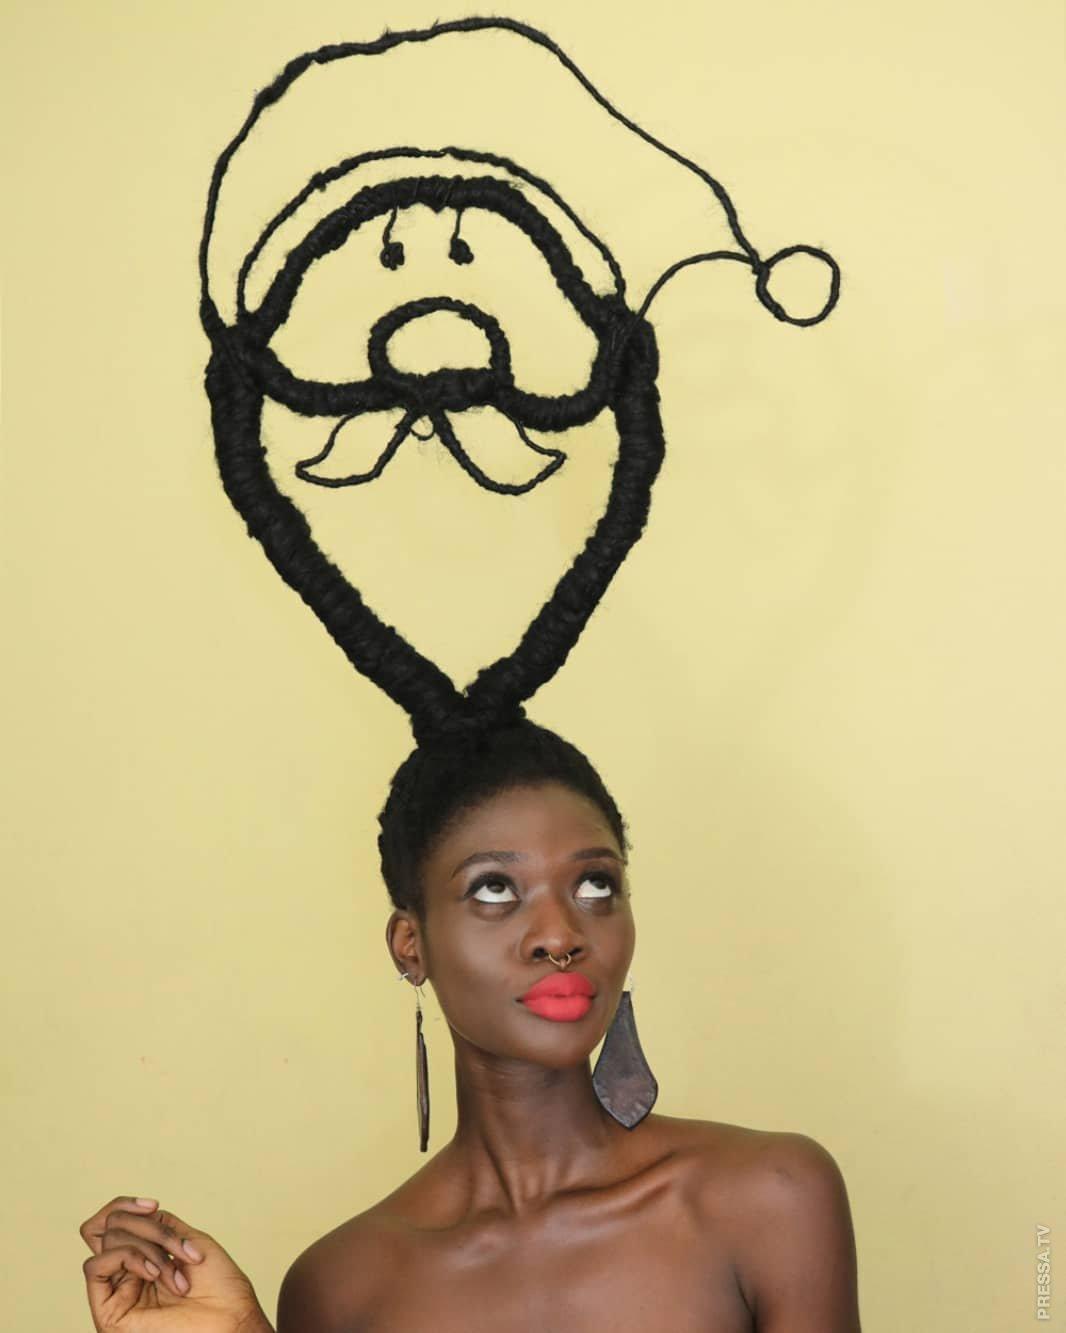 картинки фигуры из волос процедура необходима